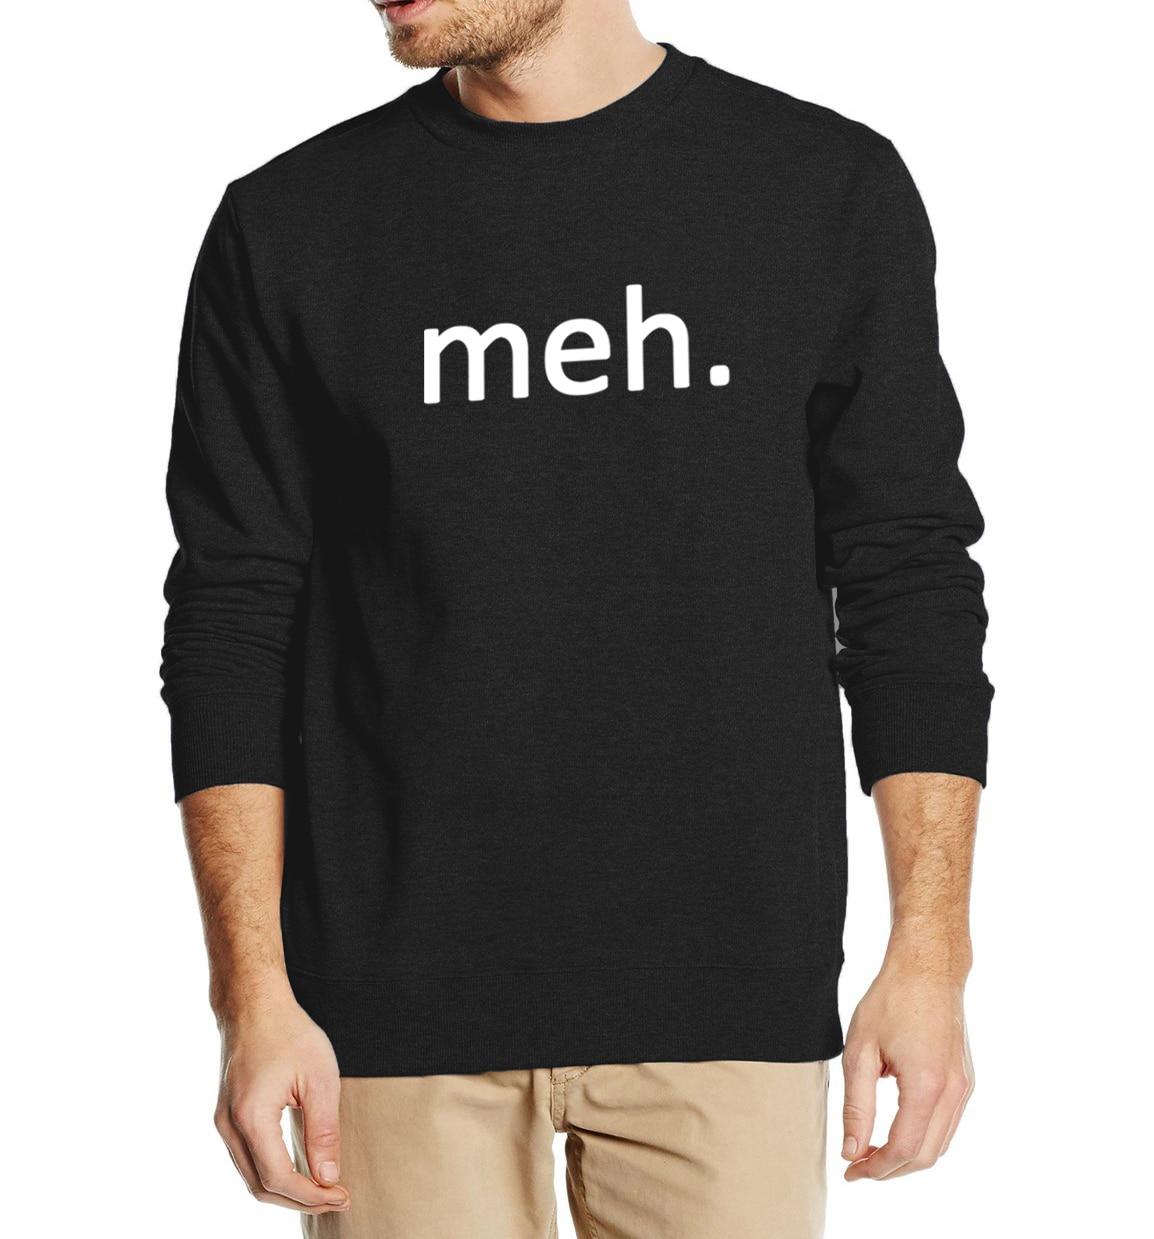 72205f1bb Lucu kaus meh. surat cetak 2018 musim gugur musim dingin mode pria hoodies  streetwear bulu merek olahraga berkualitas tinggi S-XXL